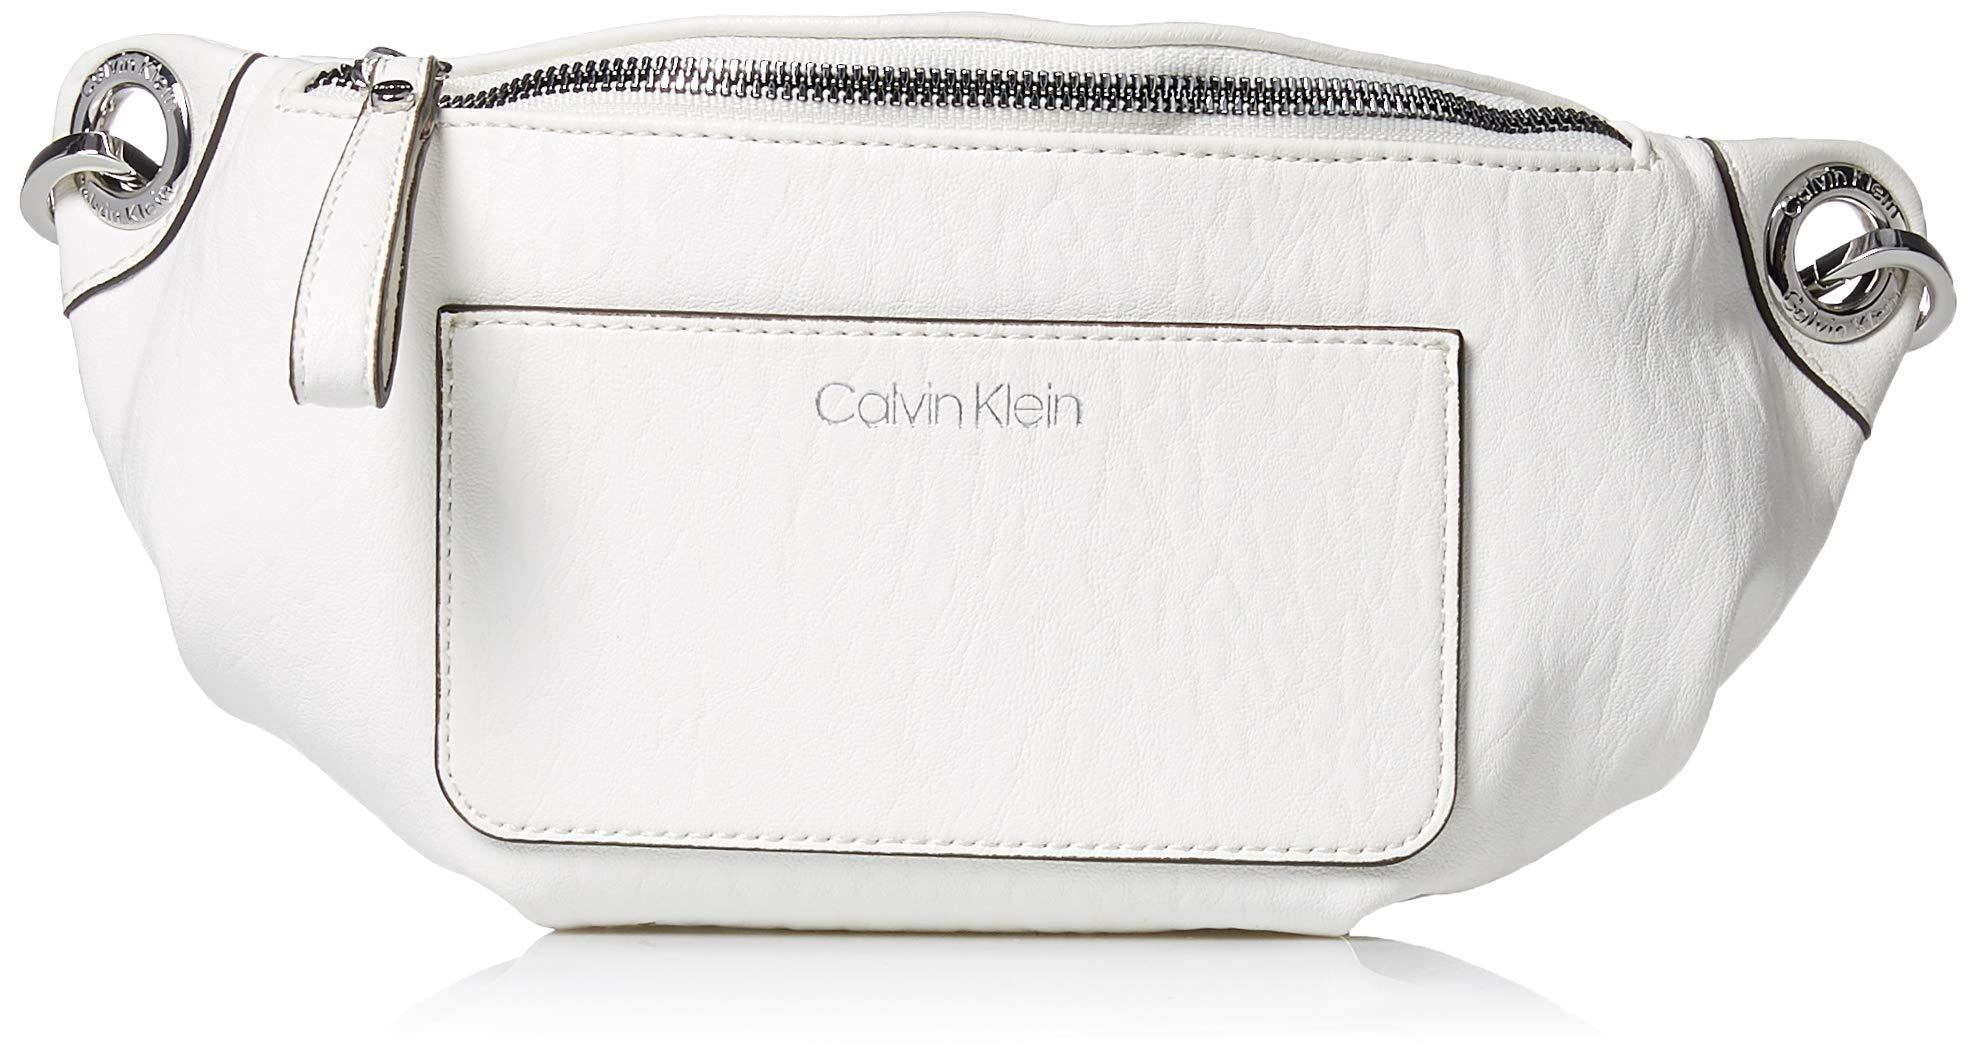 Calvin Klein Sonoma Bubble Lamb Novelty Belt Bag, white